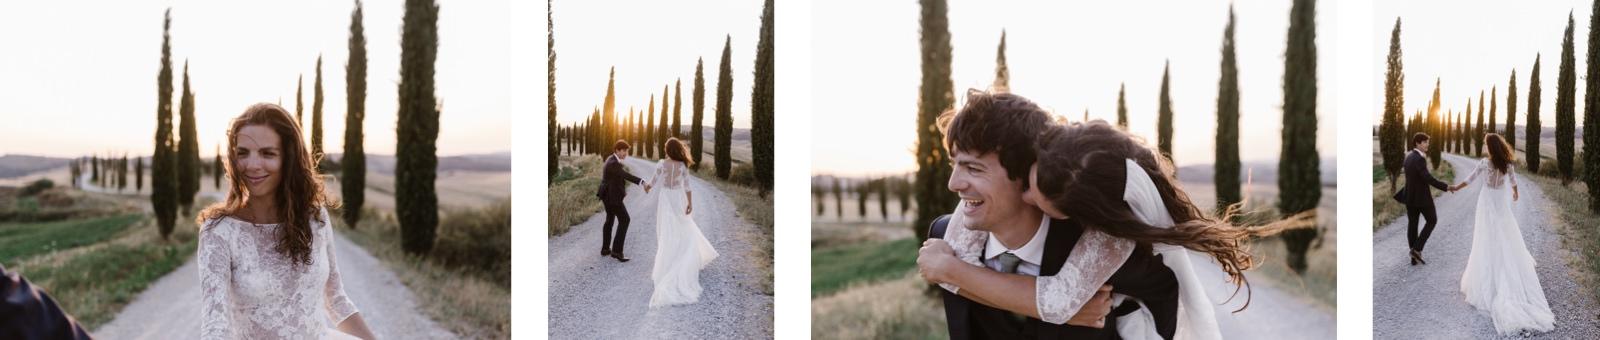 Fotomagoria Tuscany Wedding Photographer 33.jpg